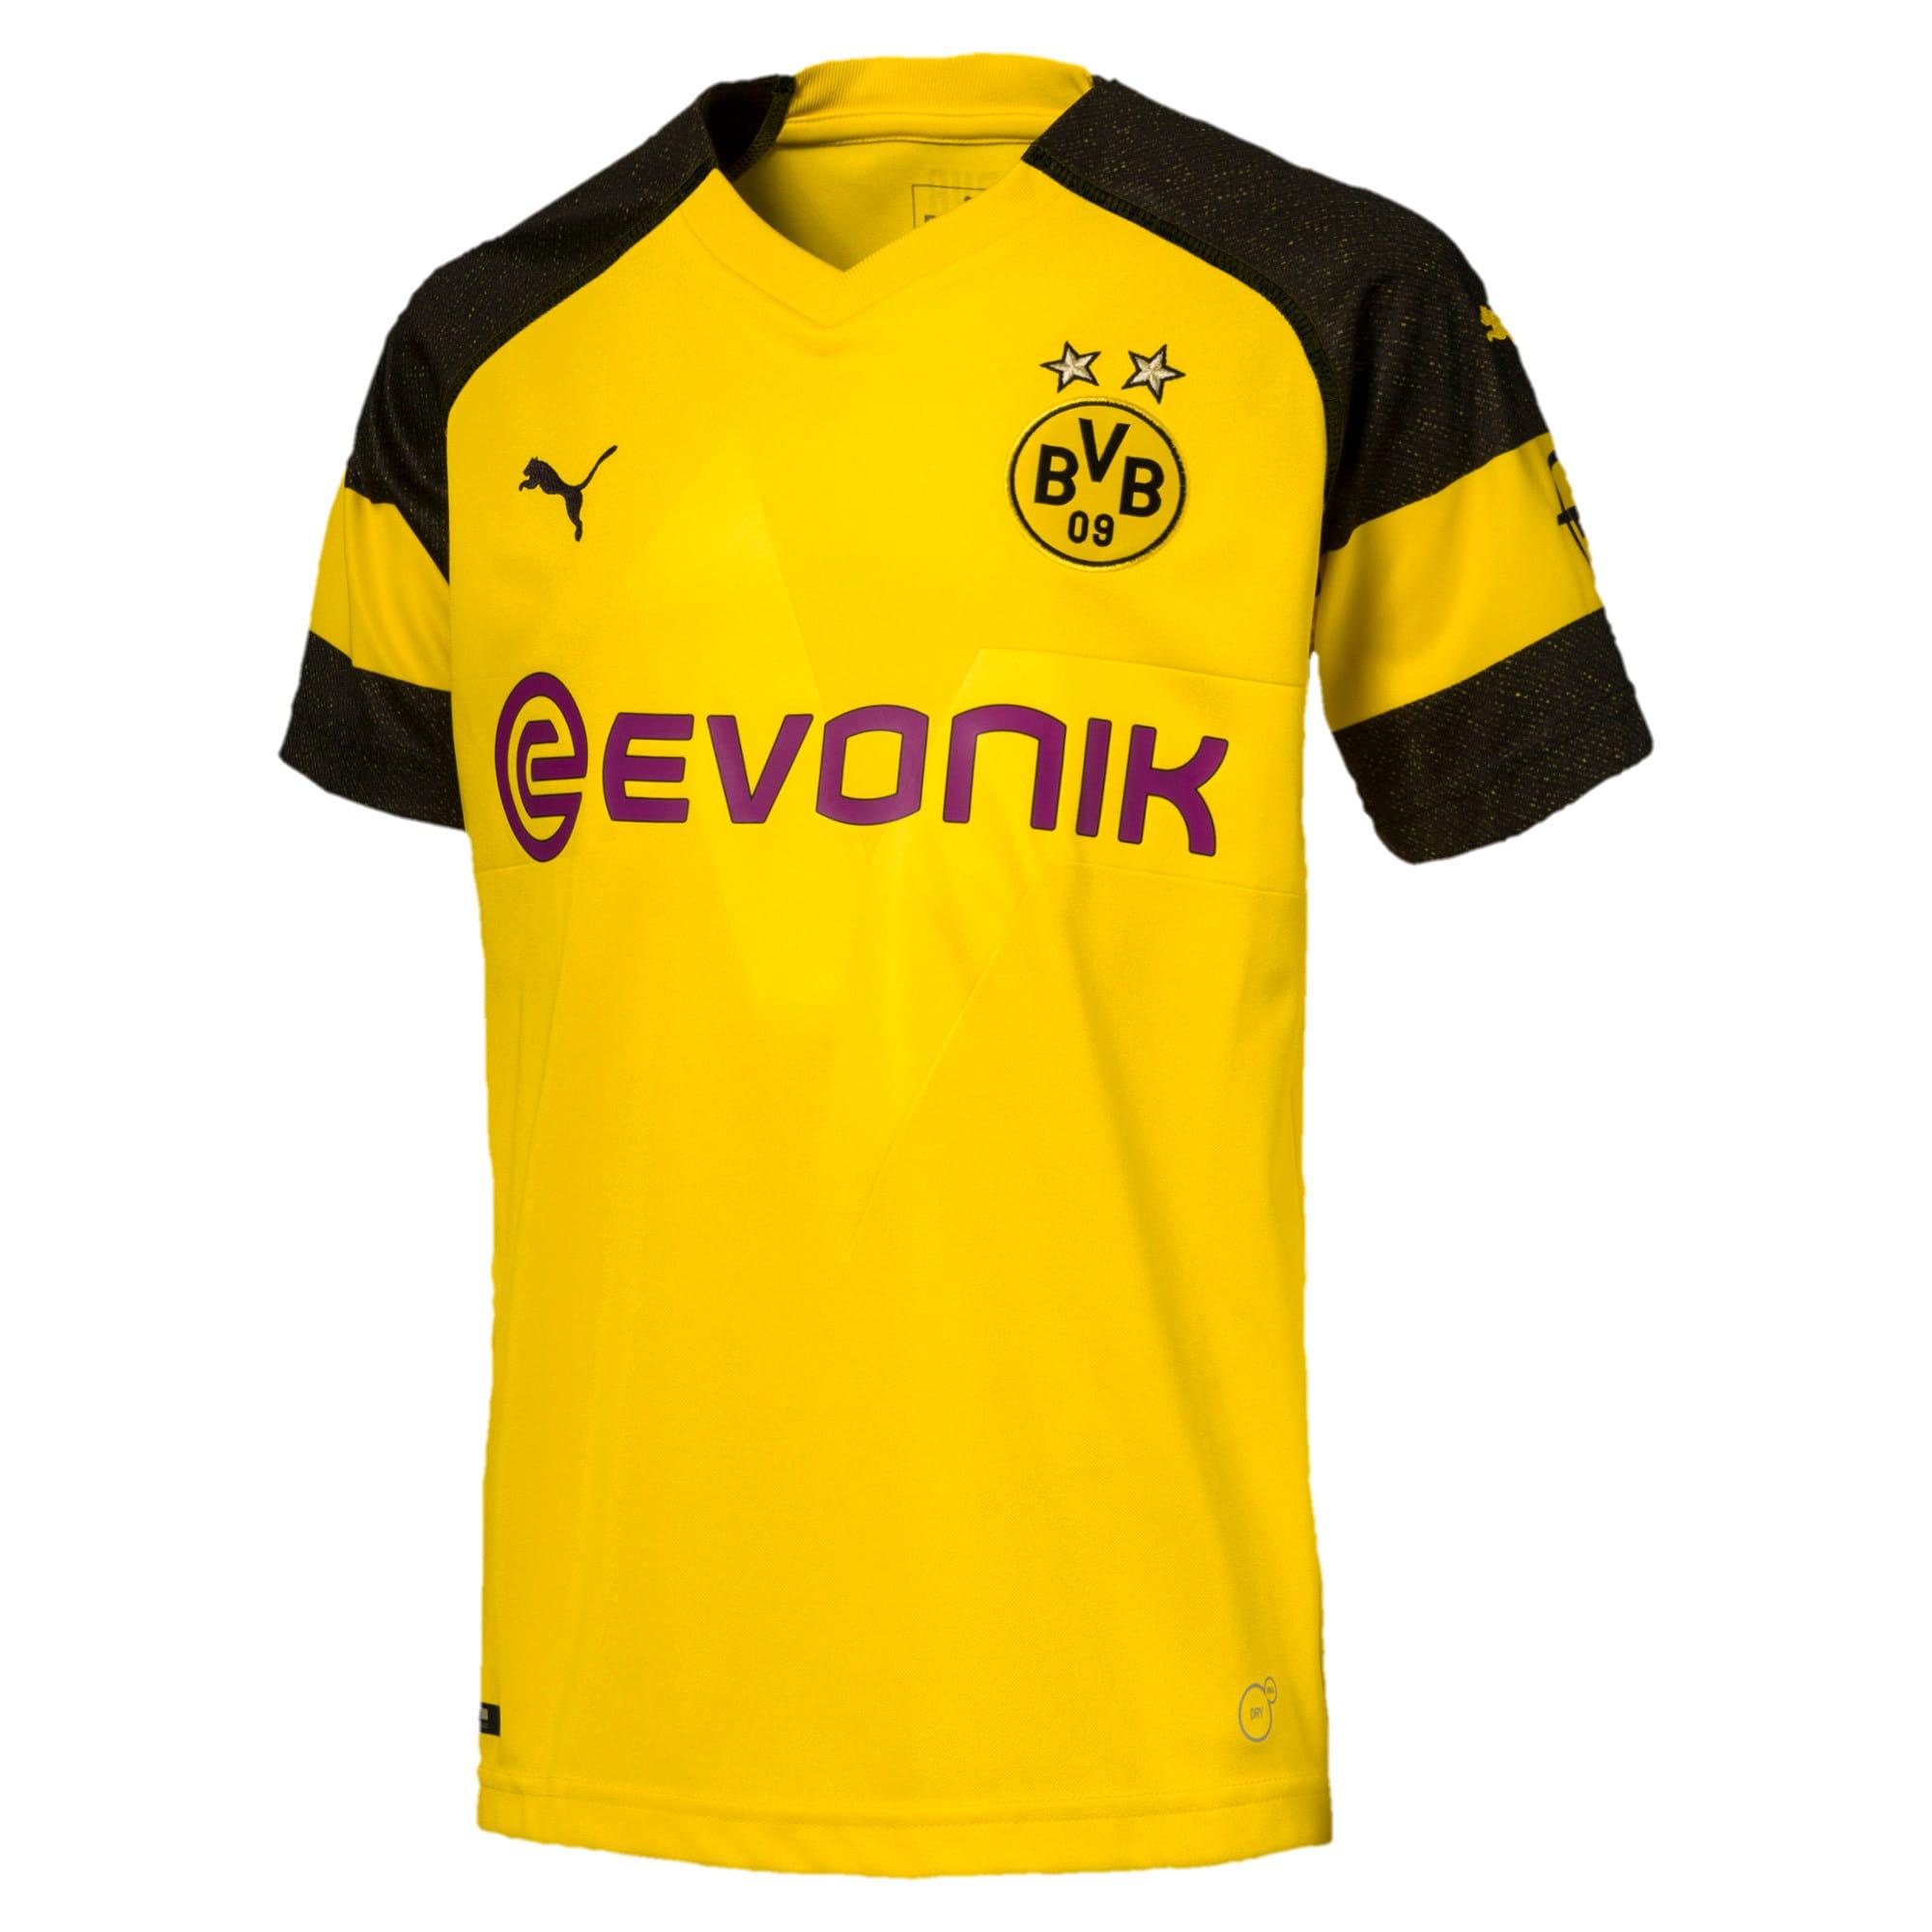 Thumbnail 1 of キッズ BVB ホーム レプリカシャツ, Cyber Yellow, medium-JPN